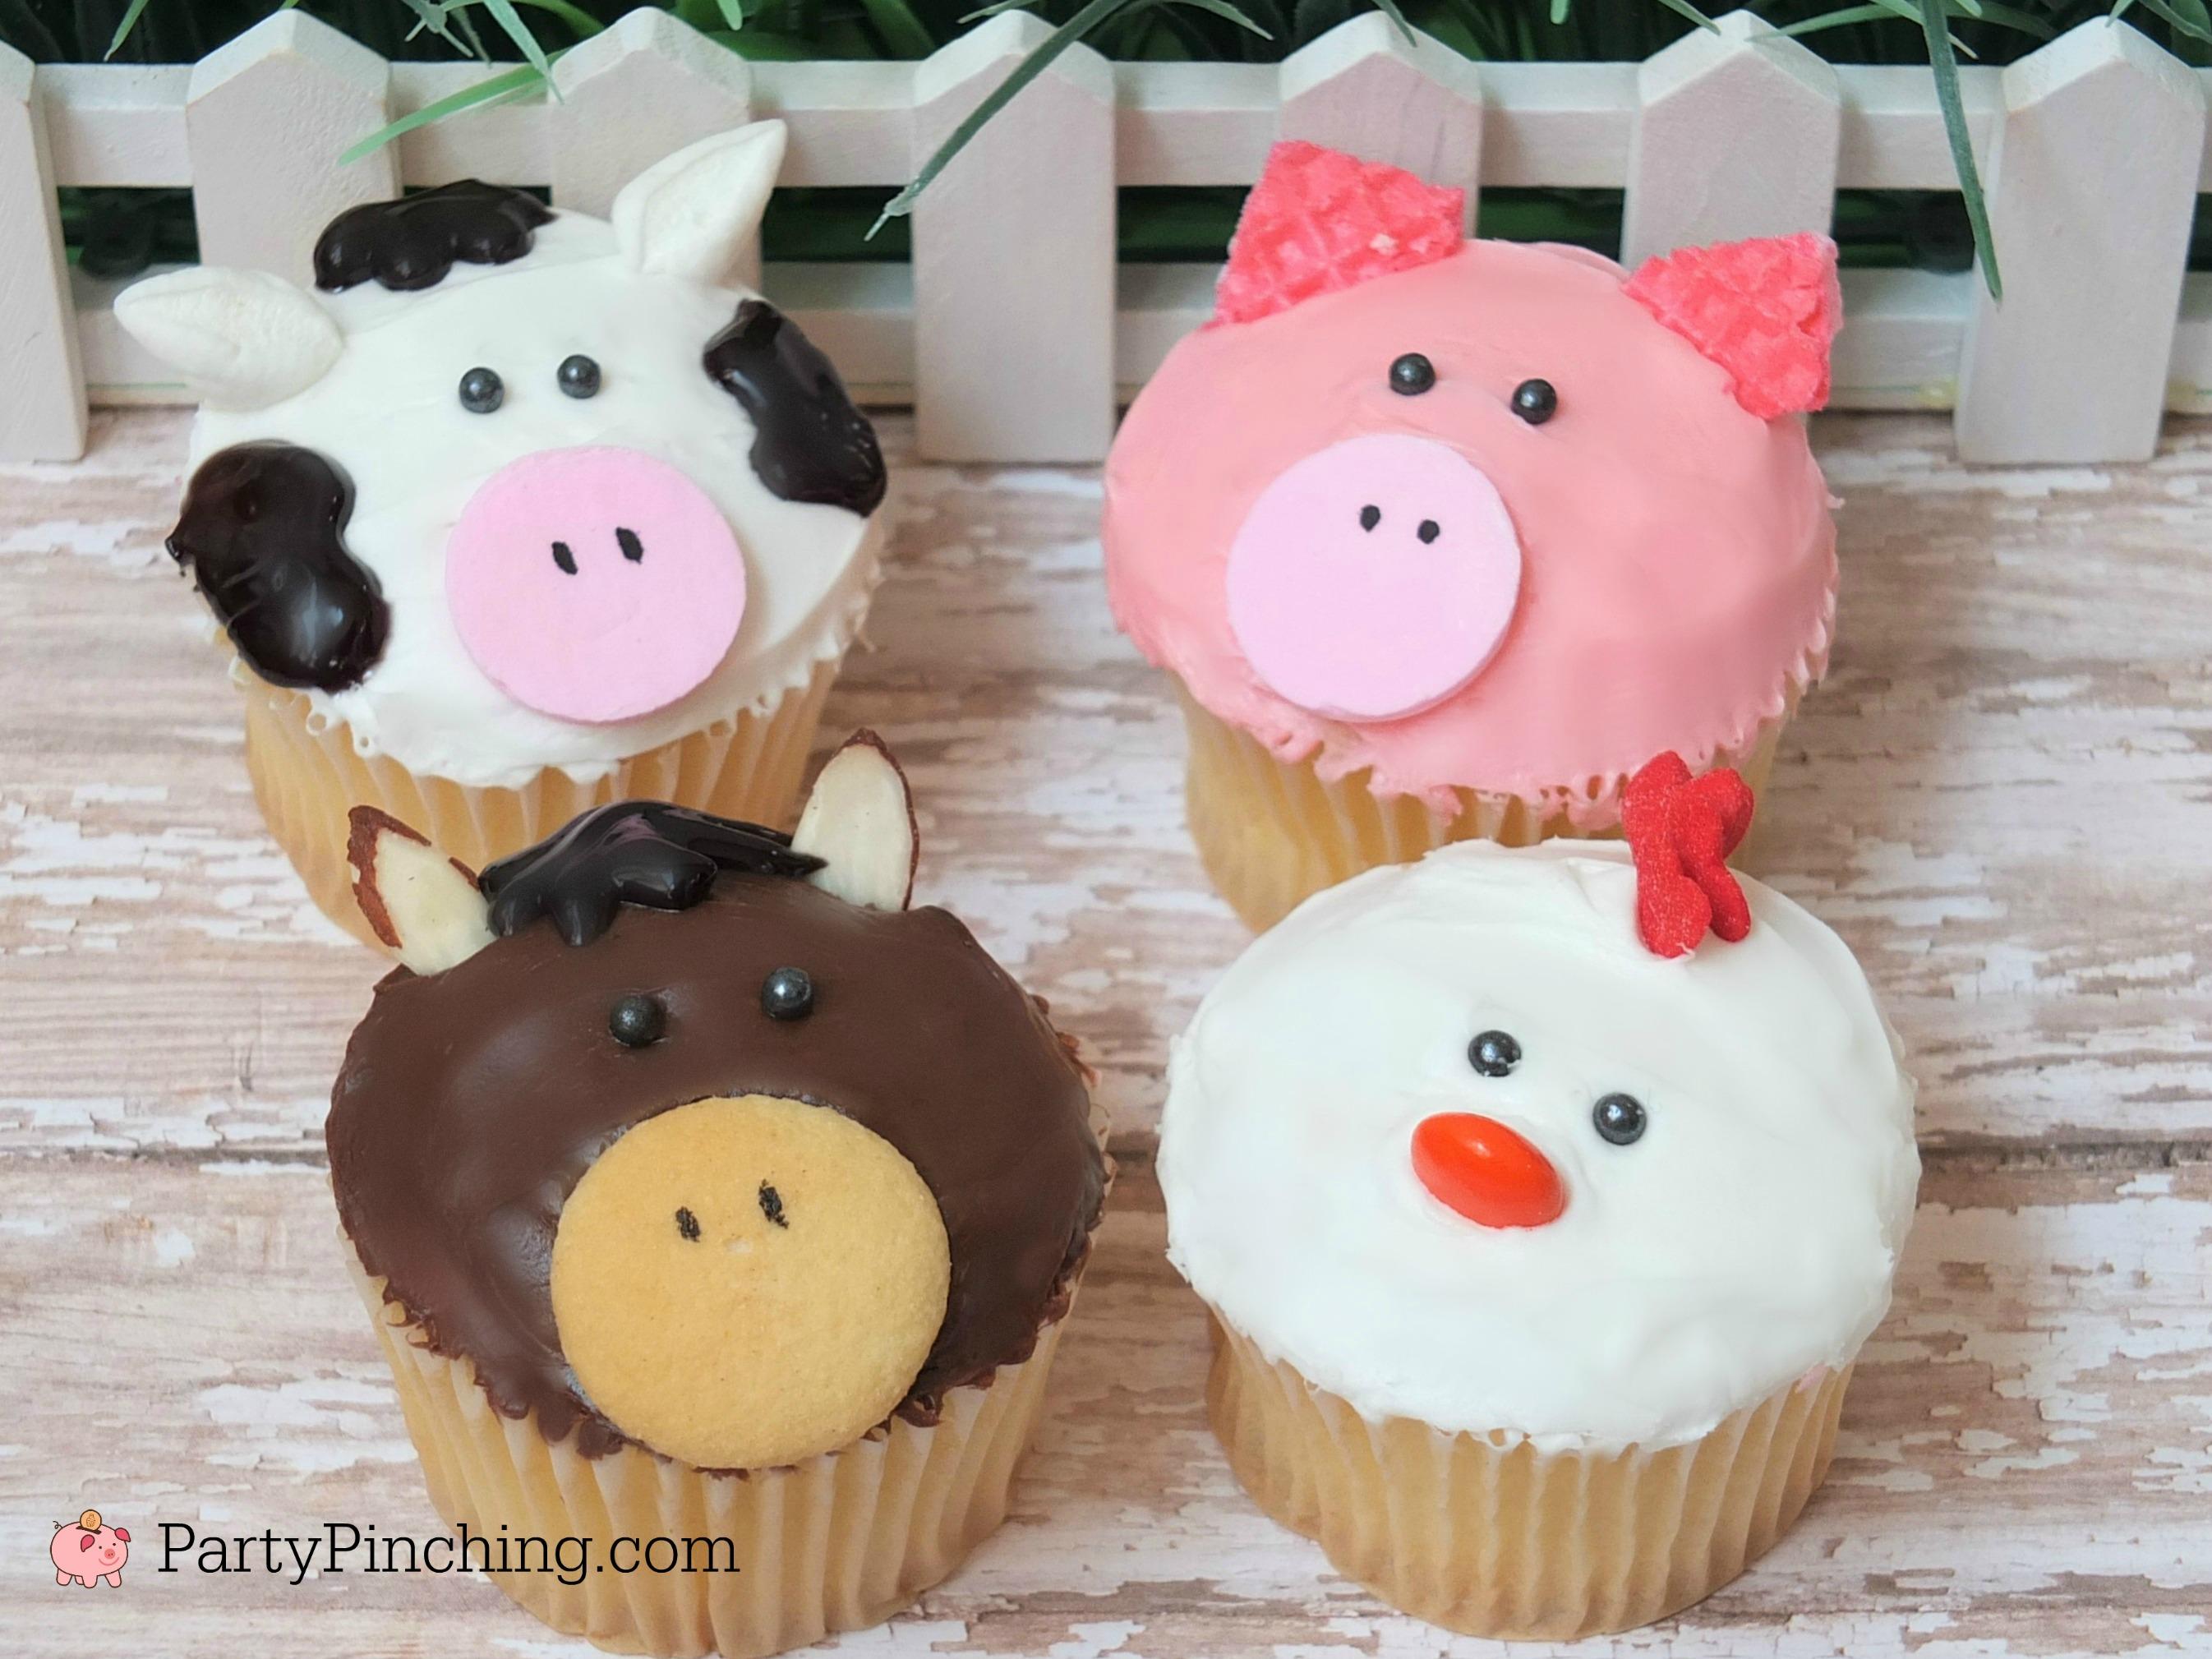 Cute Cake Decorating Ideas